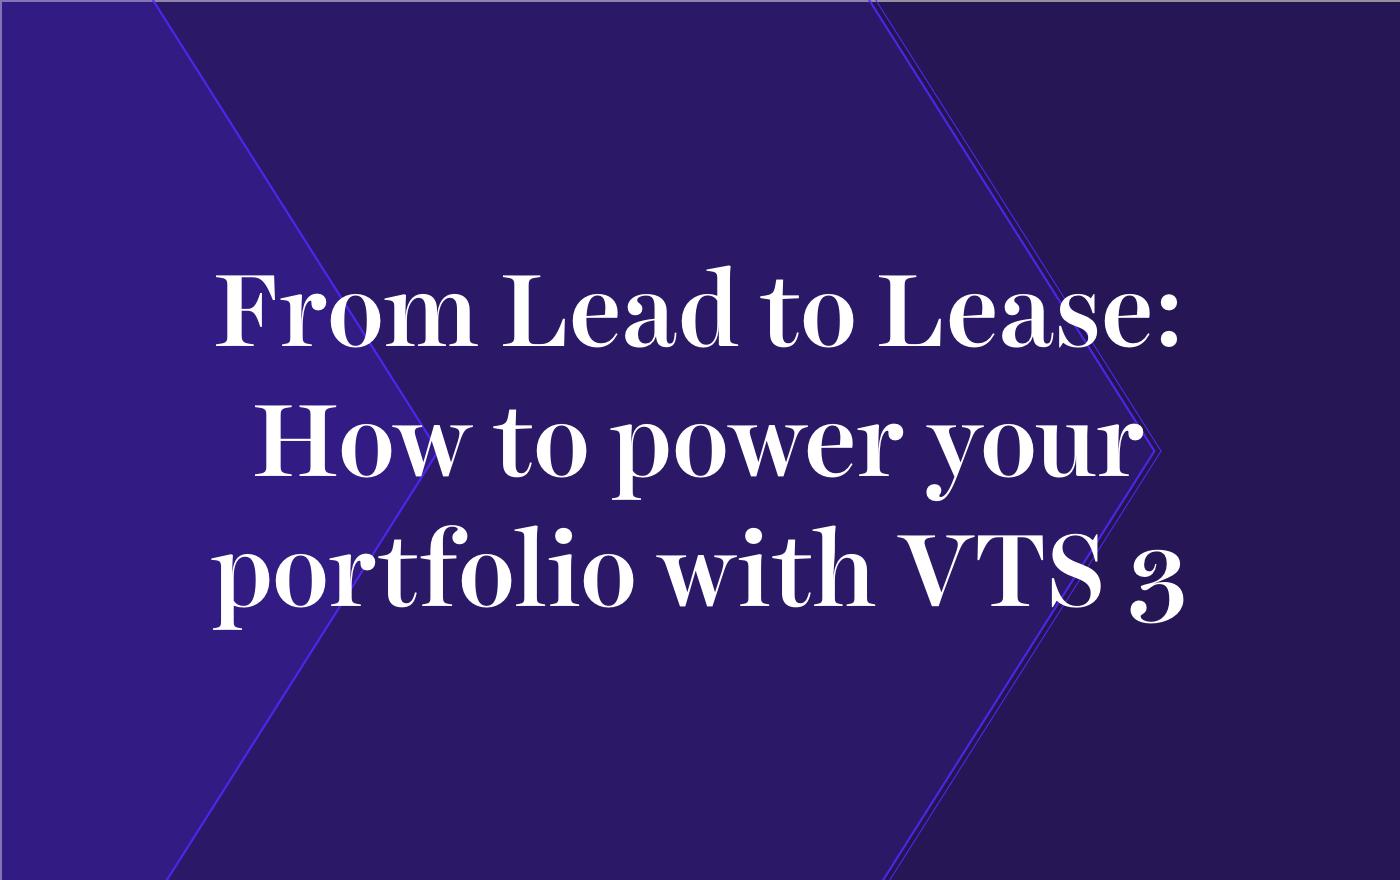 VTS - The #1 Leasing & Asset Management Platform